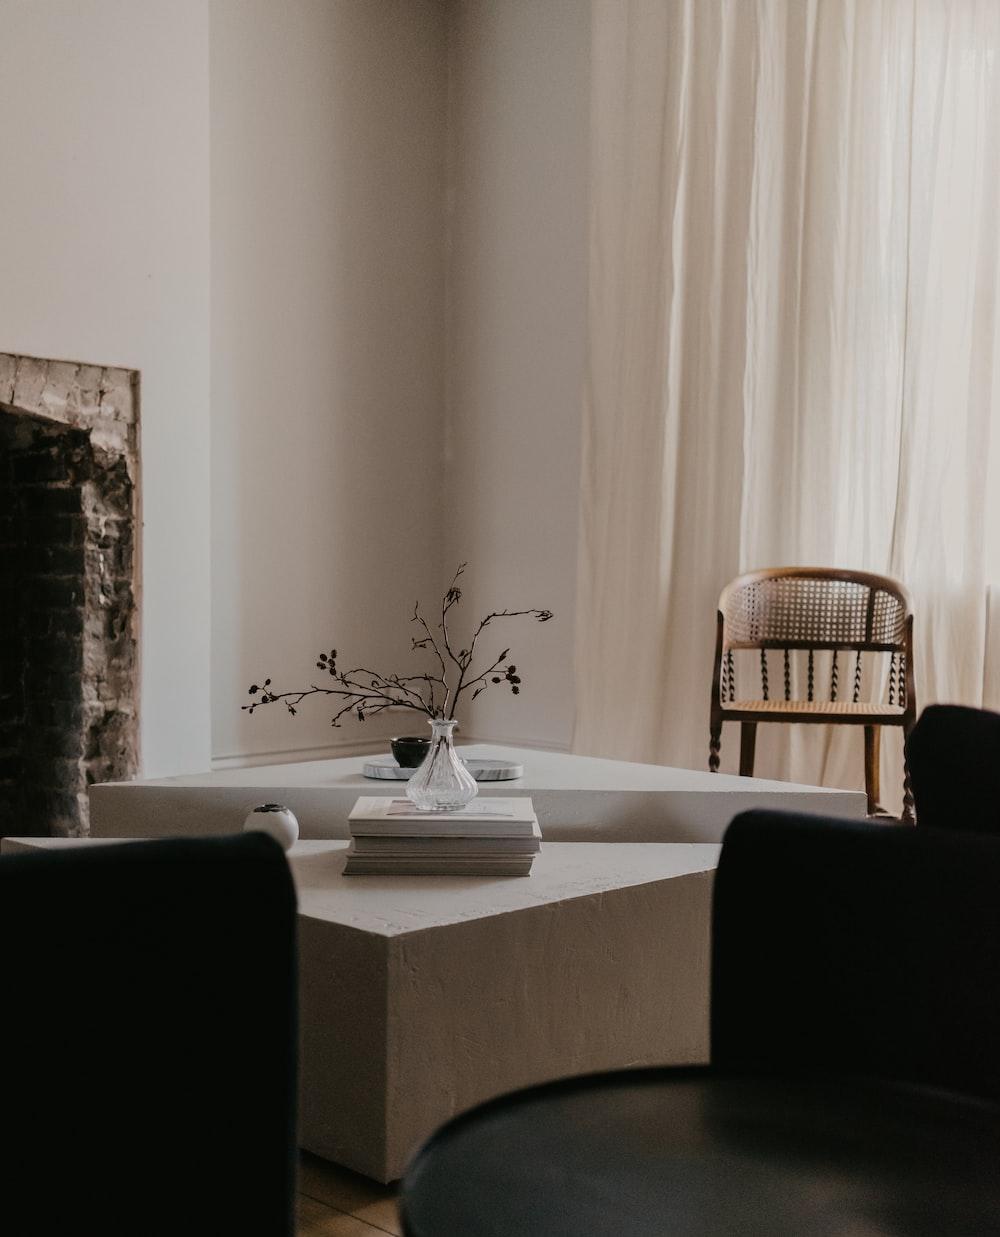 white ceramic plate on white table